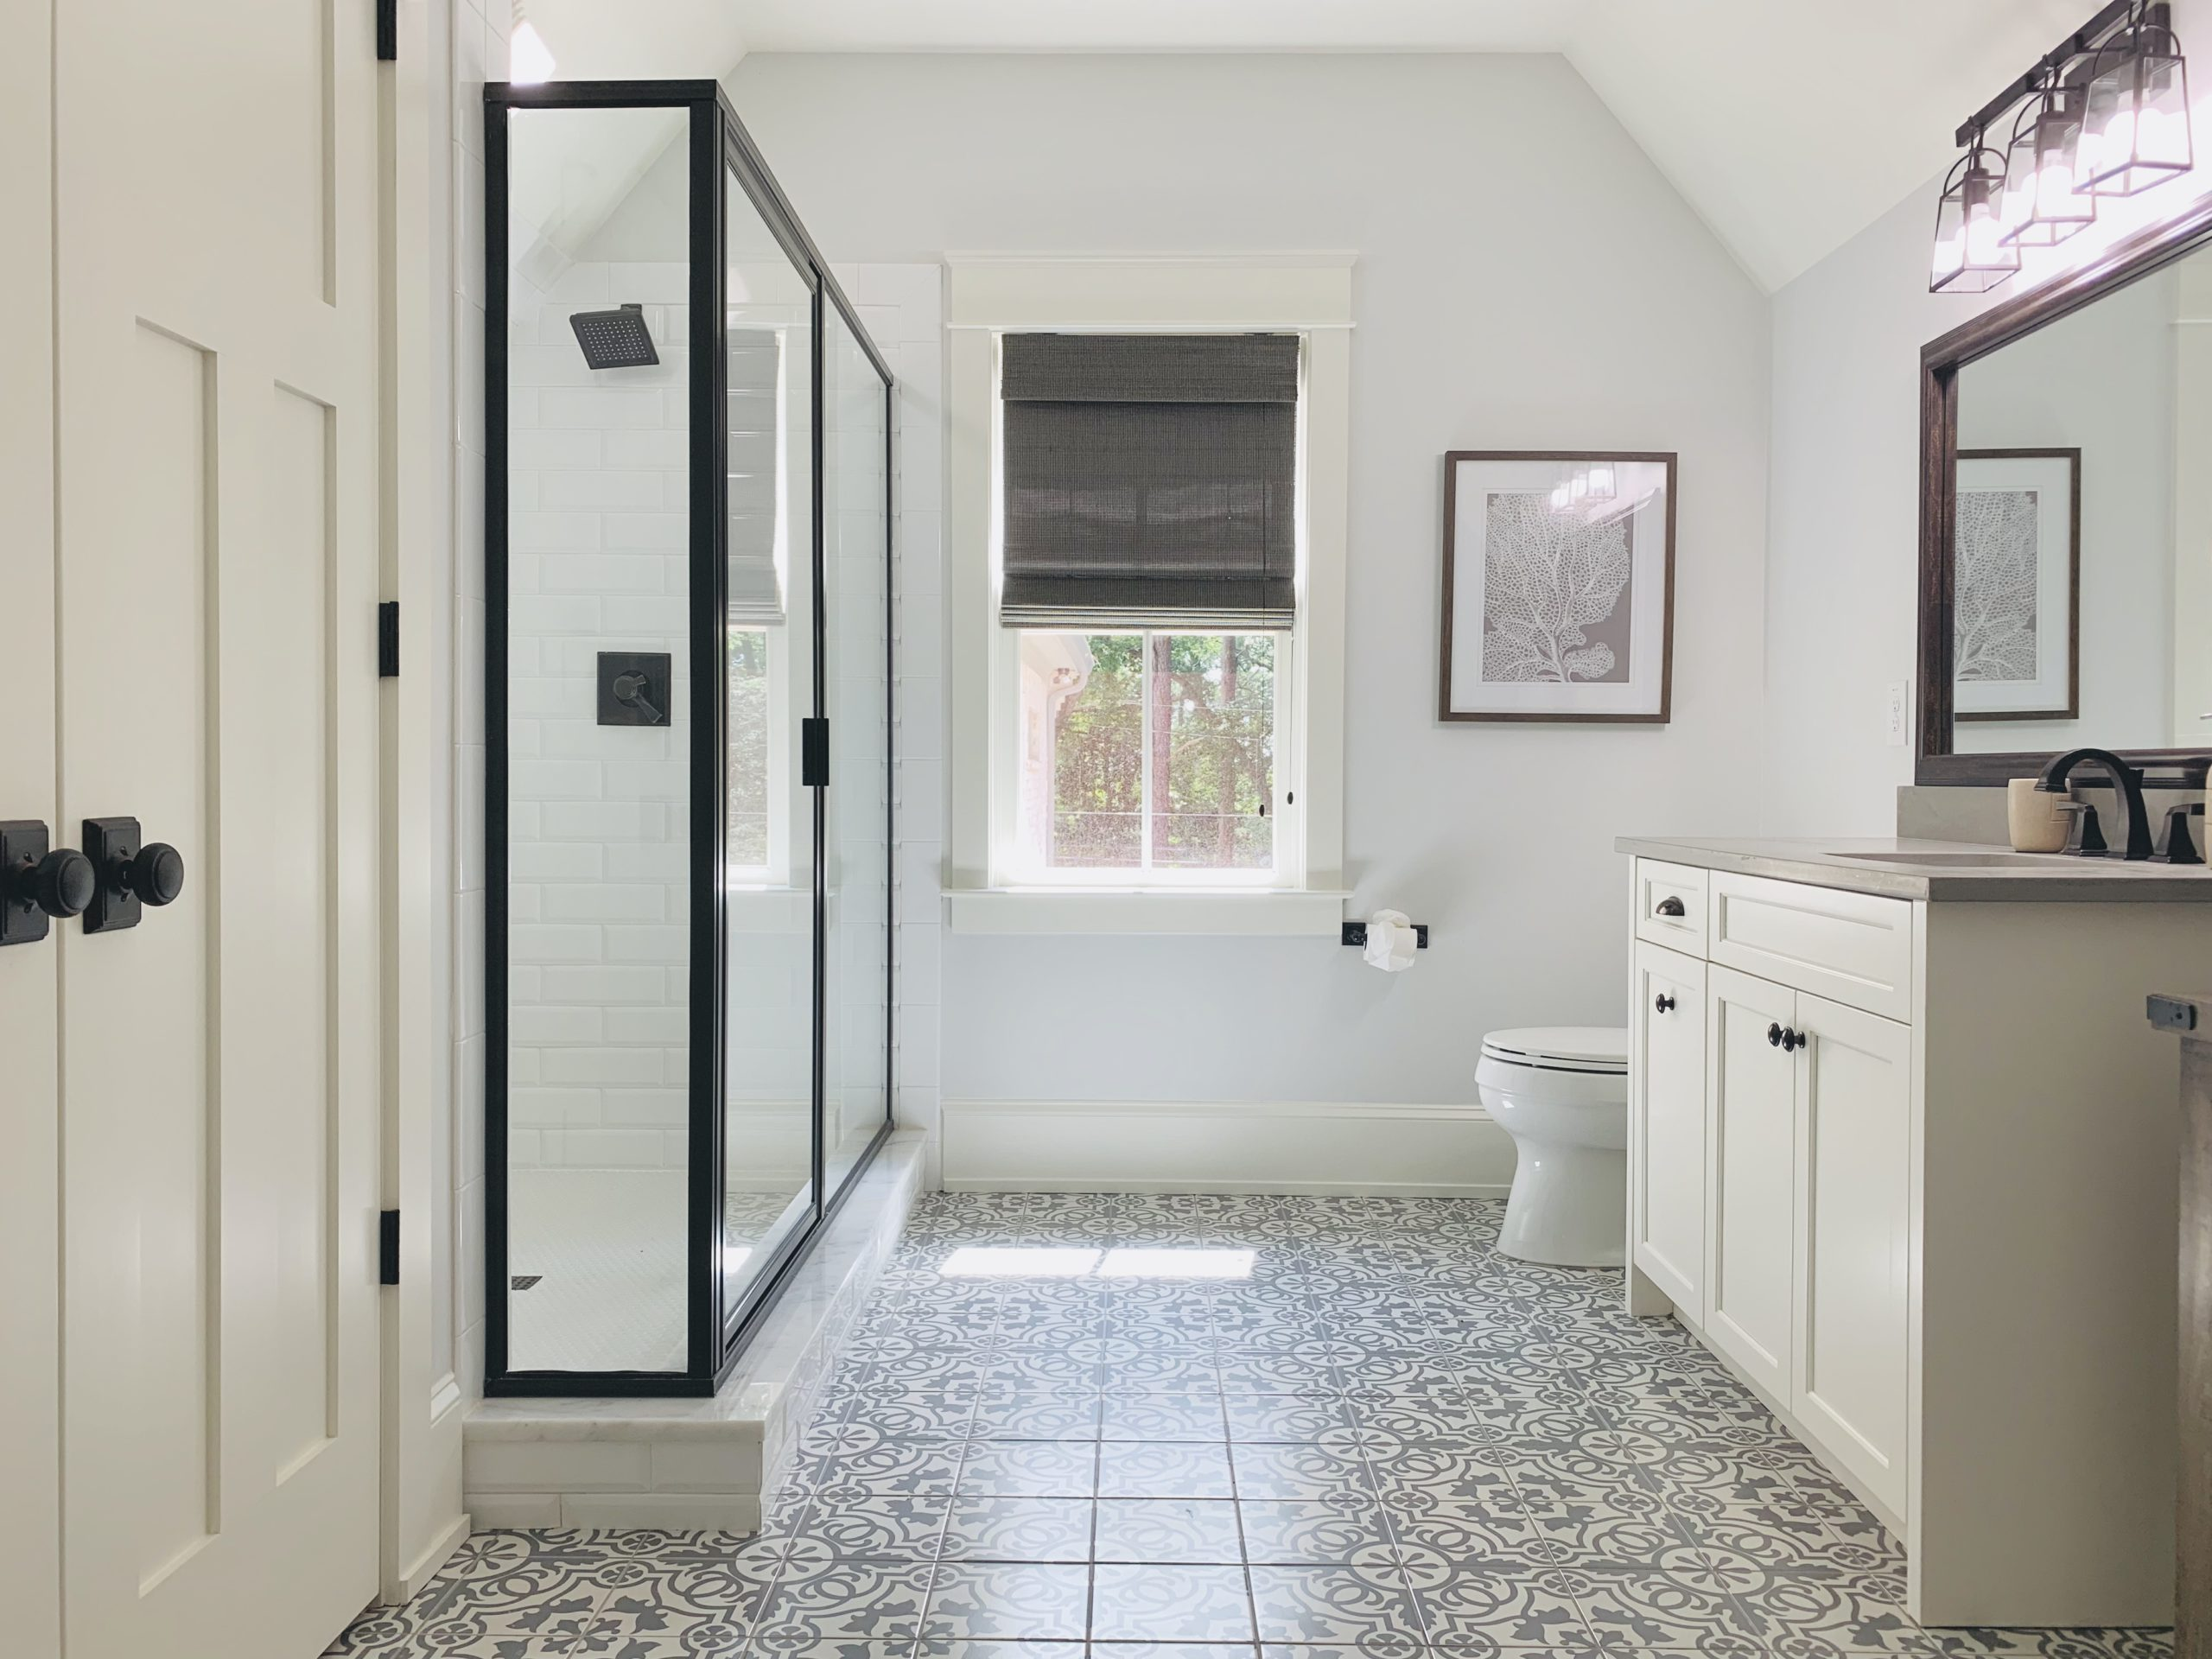 Woven_Shades_Bathroom